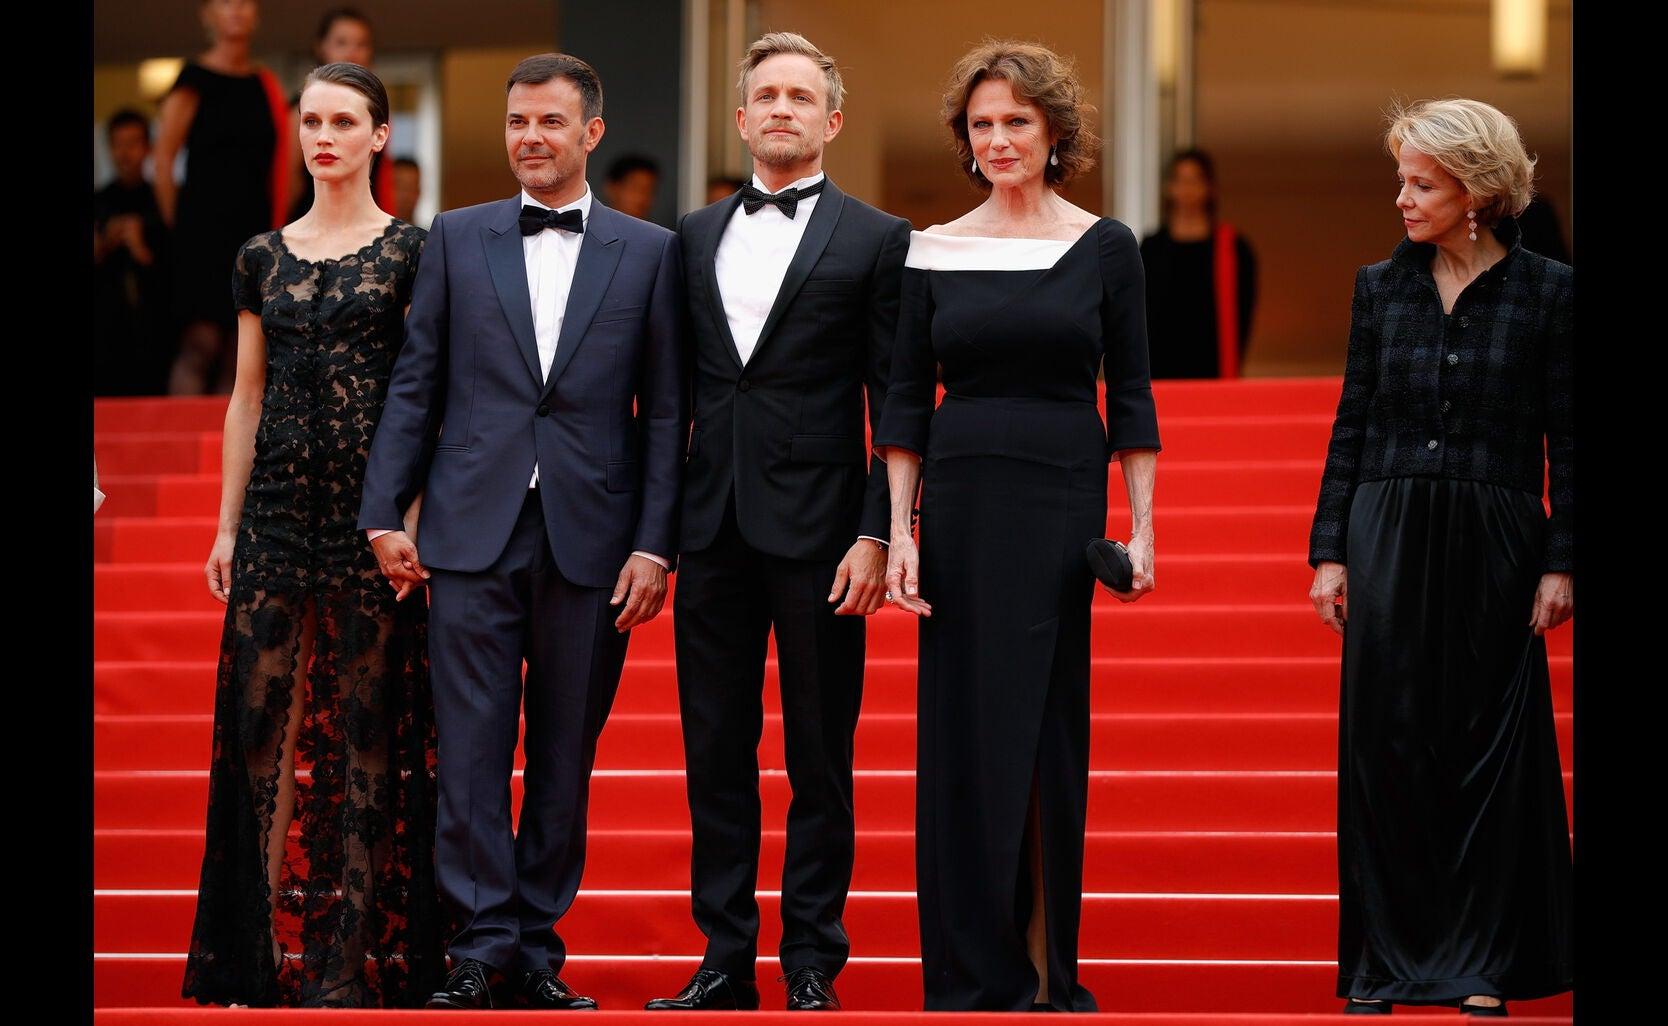 Marine Vacth, Francois Ozon, Jeremie Renier, Jacqueline Bisset and Frederique Bredin